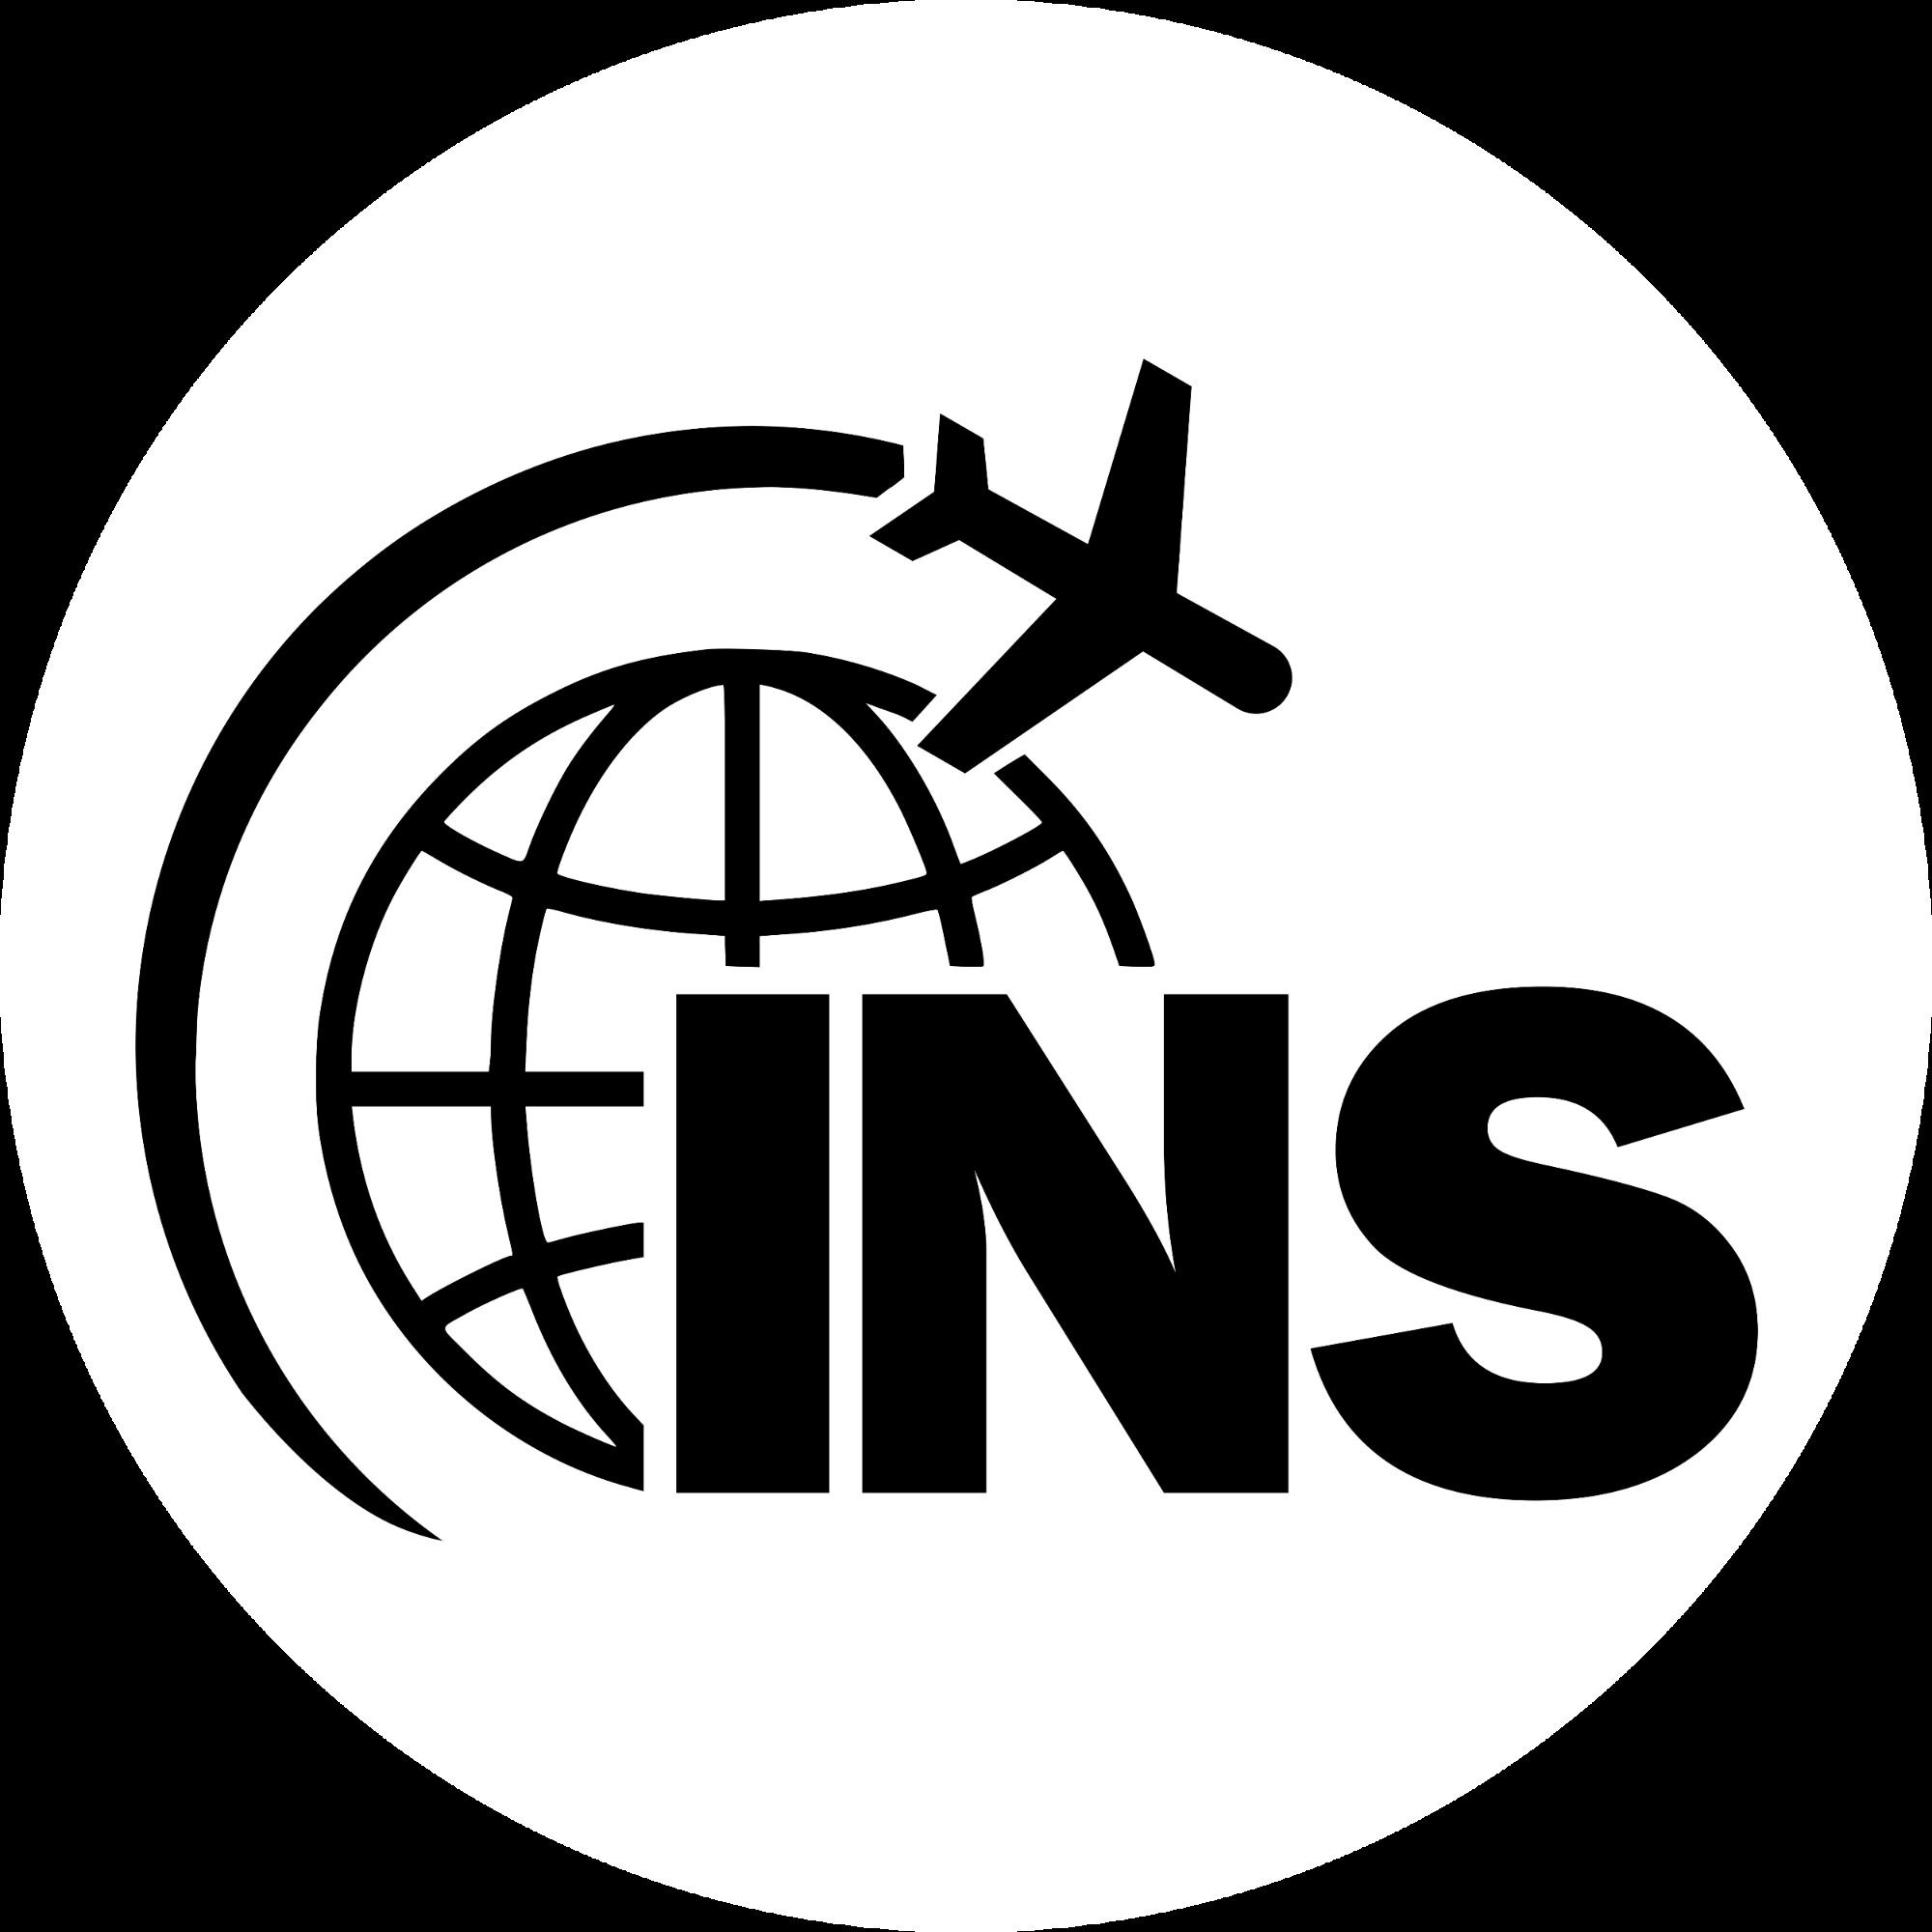 INS, Institute of Navigation at the University of Stuttgart